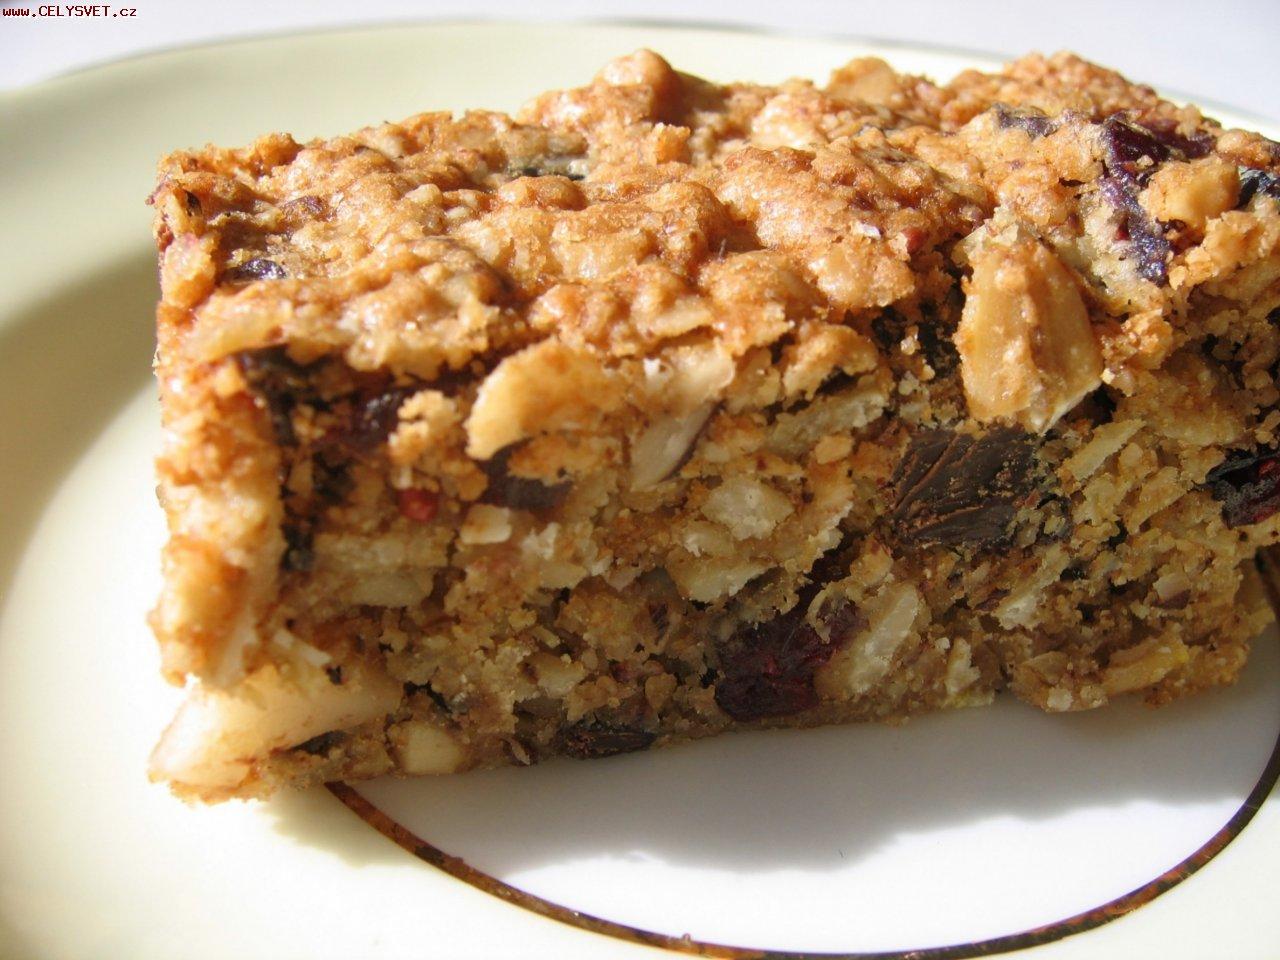 рецепты с фото десертов без выпечки